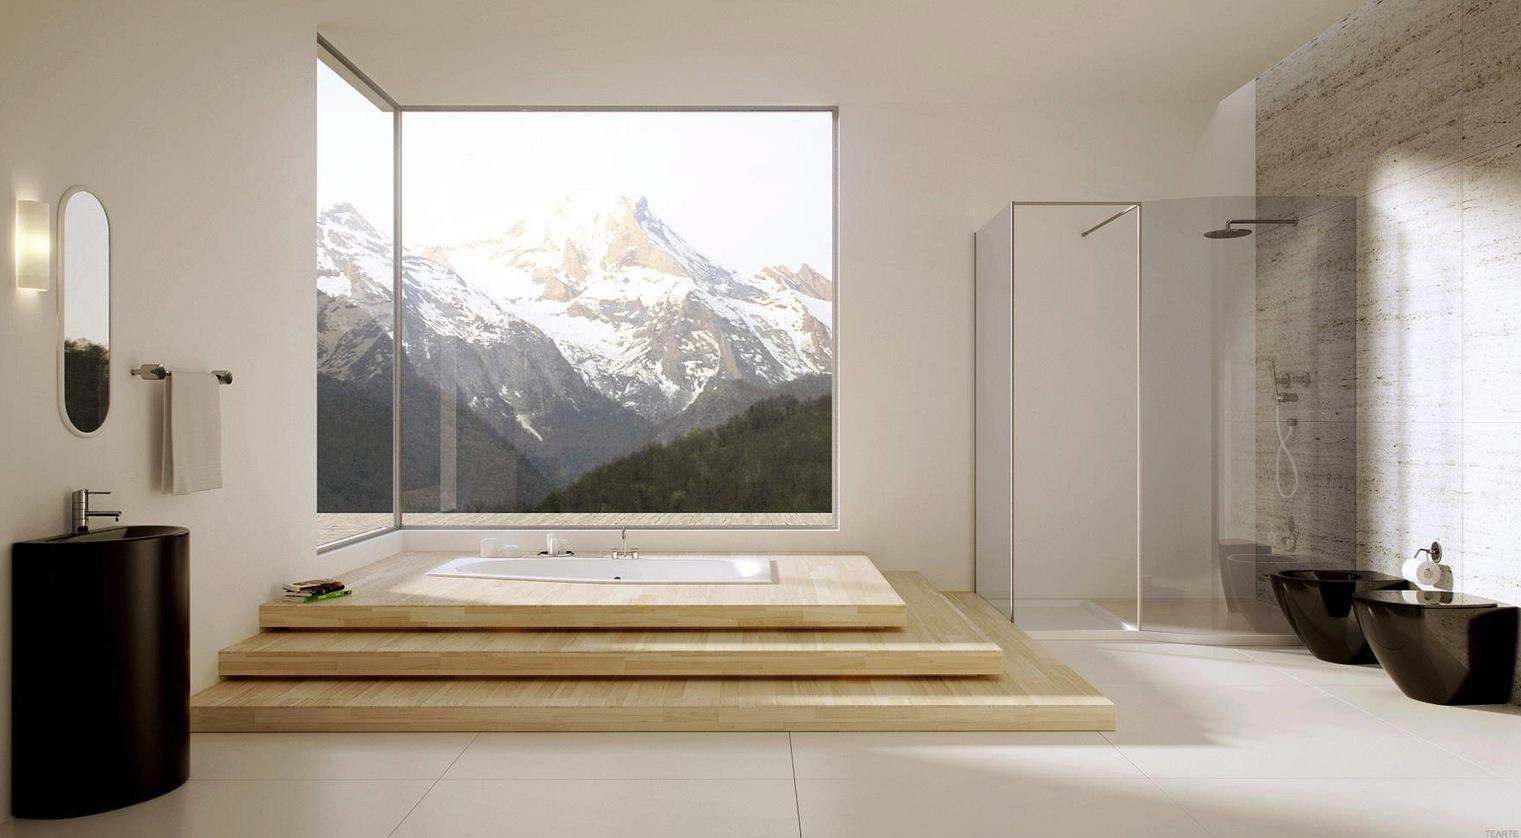 Amazing Bathrooms With Futuristic Bathtub Designs